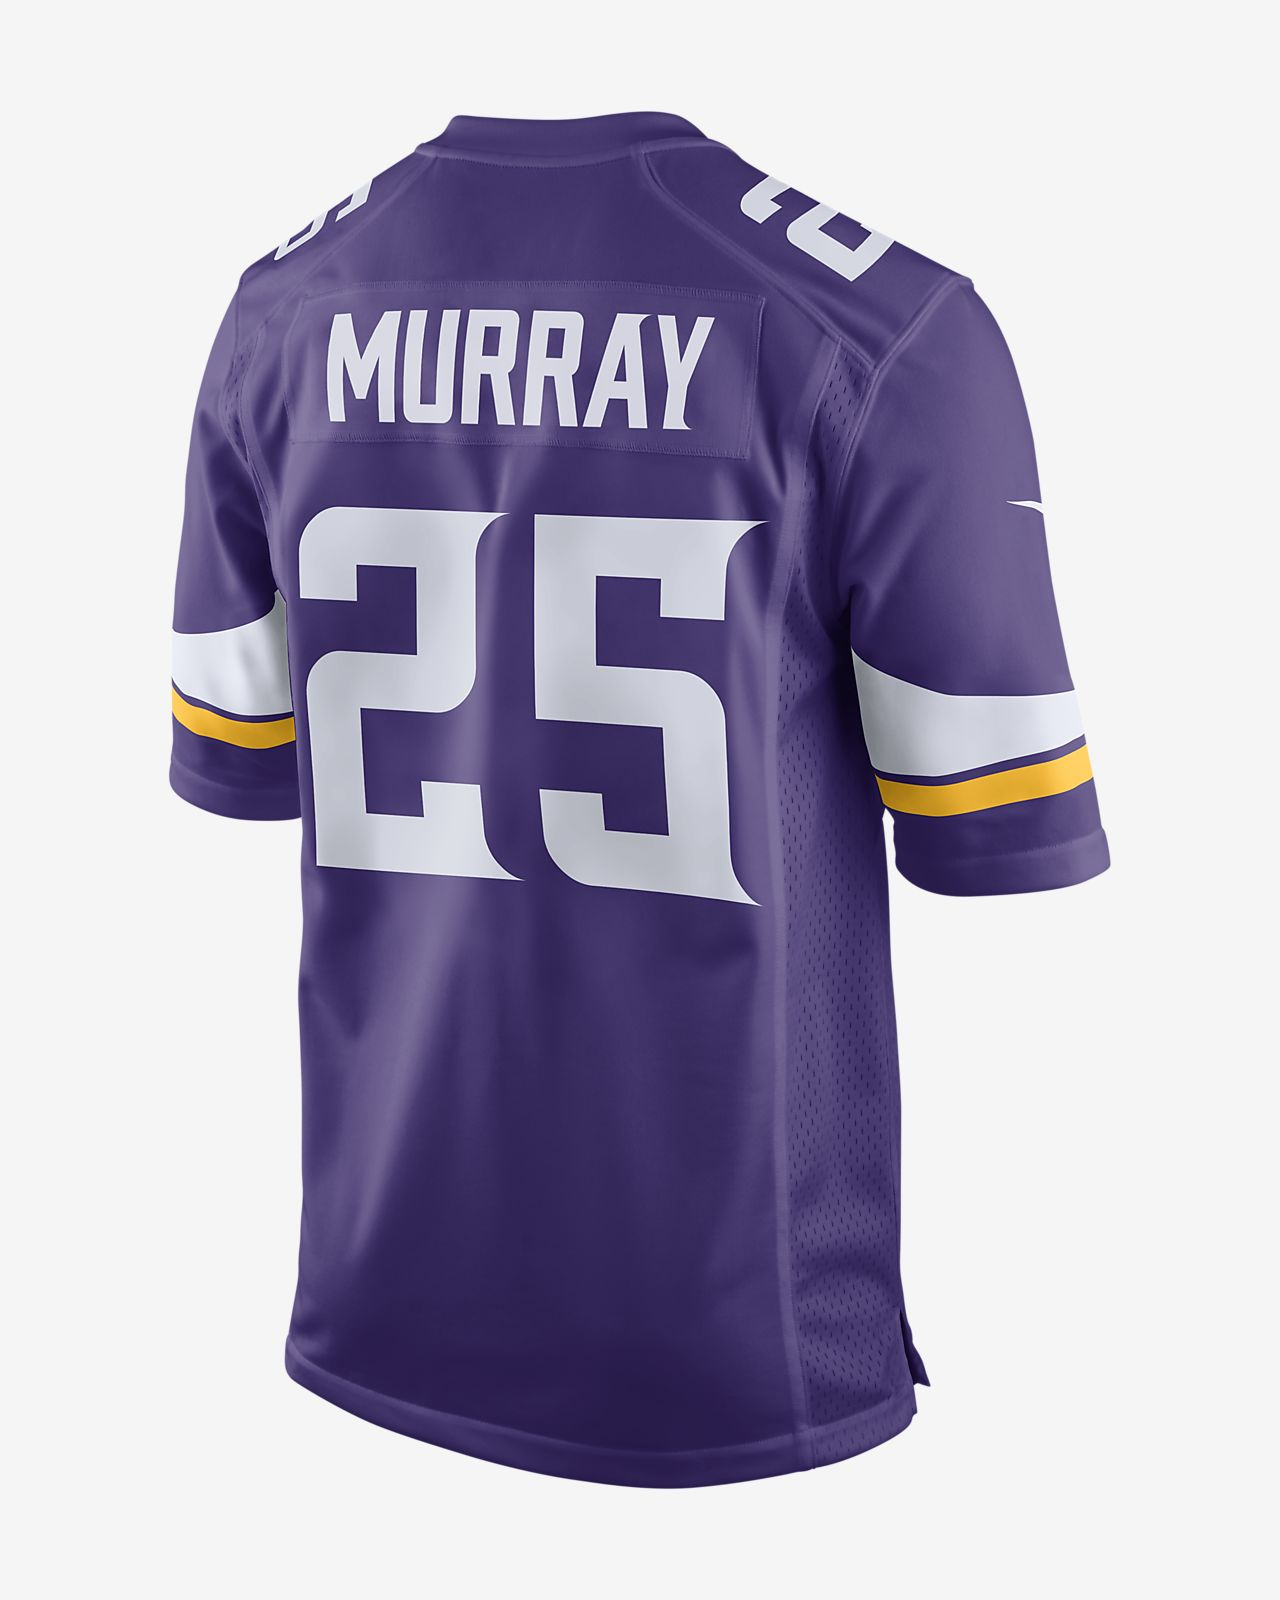 2fbe2c83454 ... NFL Minnesota Vikings (Latavius Murray) Men's American Football Home  Game Jersey